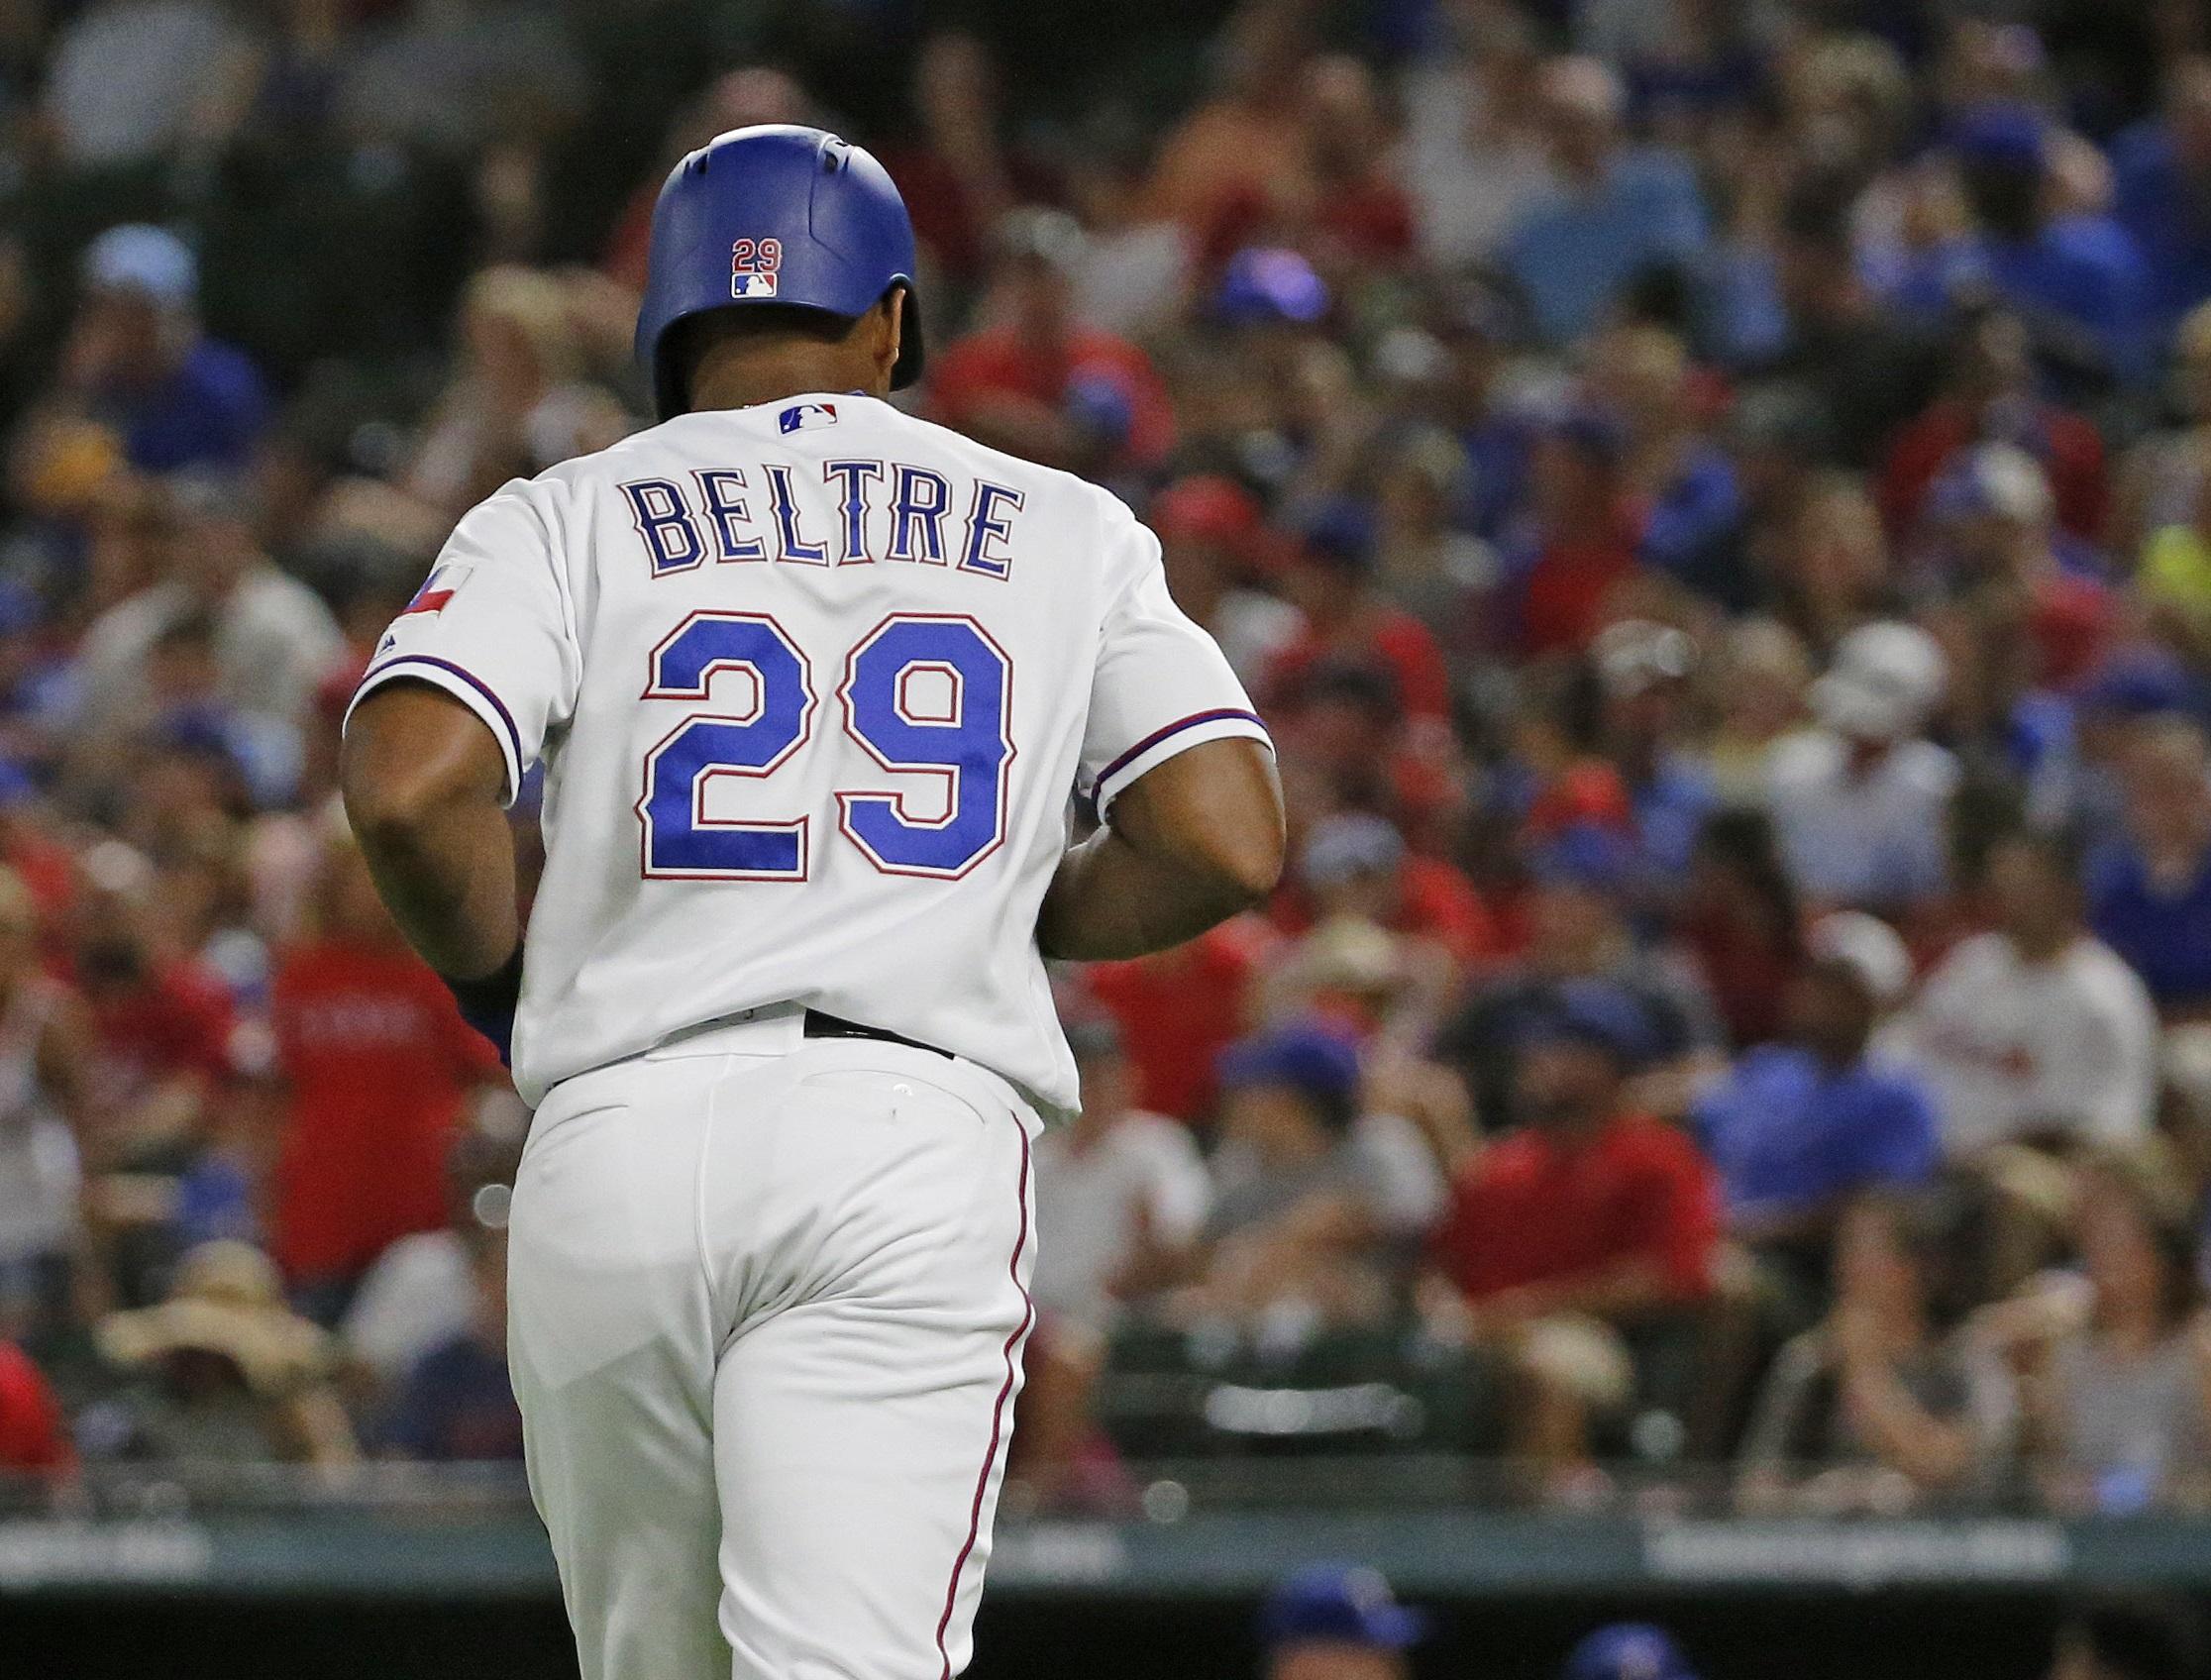 2ee28591f Texas Rangers  Rangers announce Adrian Beltre s No. 29 will be retired June  8 vs. Oakland